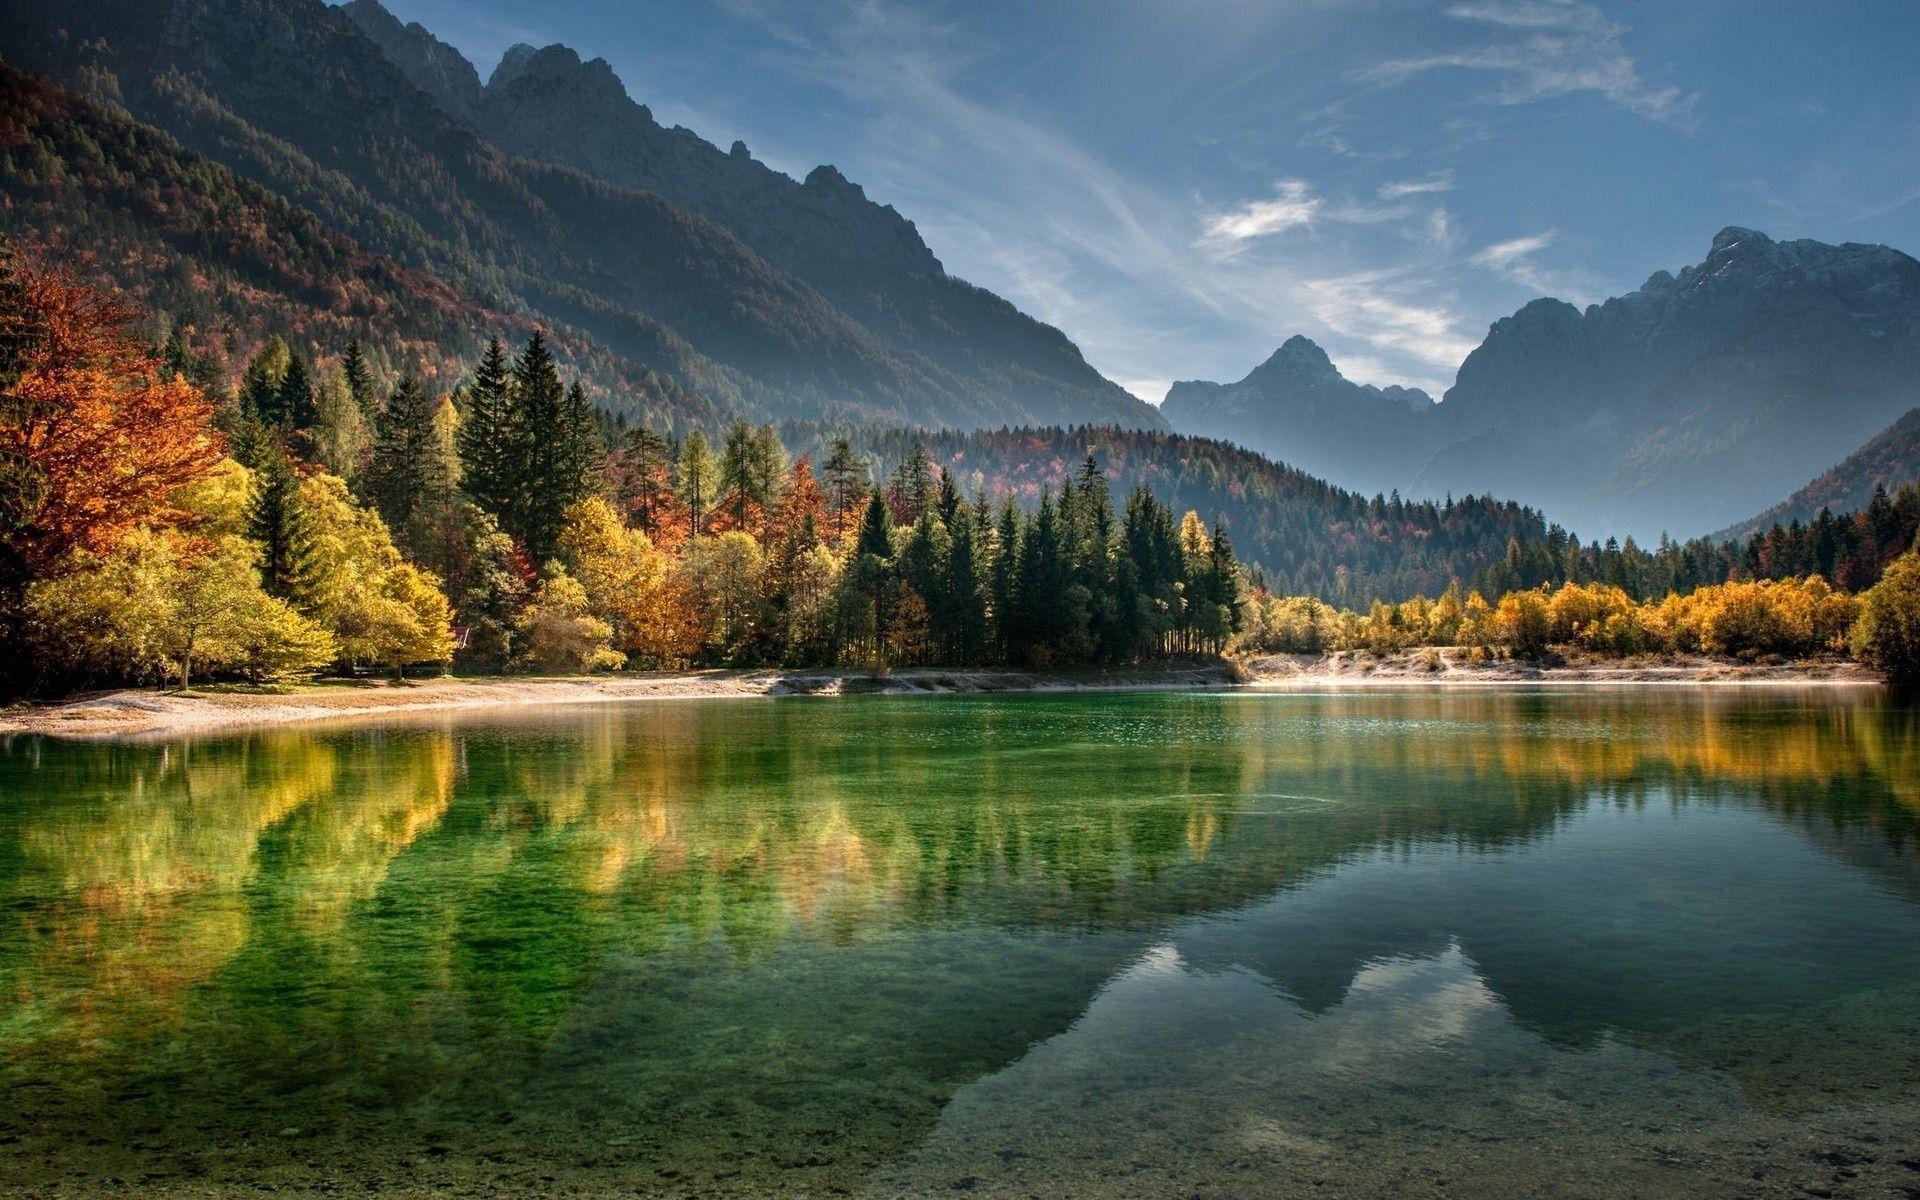 Картинки по запросу гори | Идеи озеленения, Фотографии